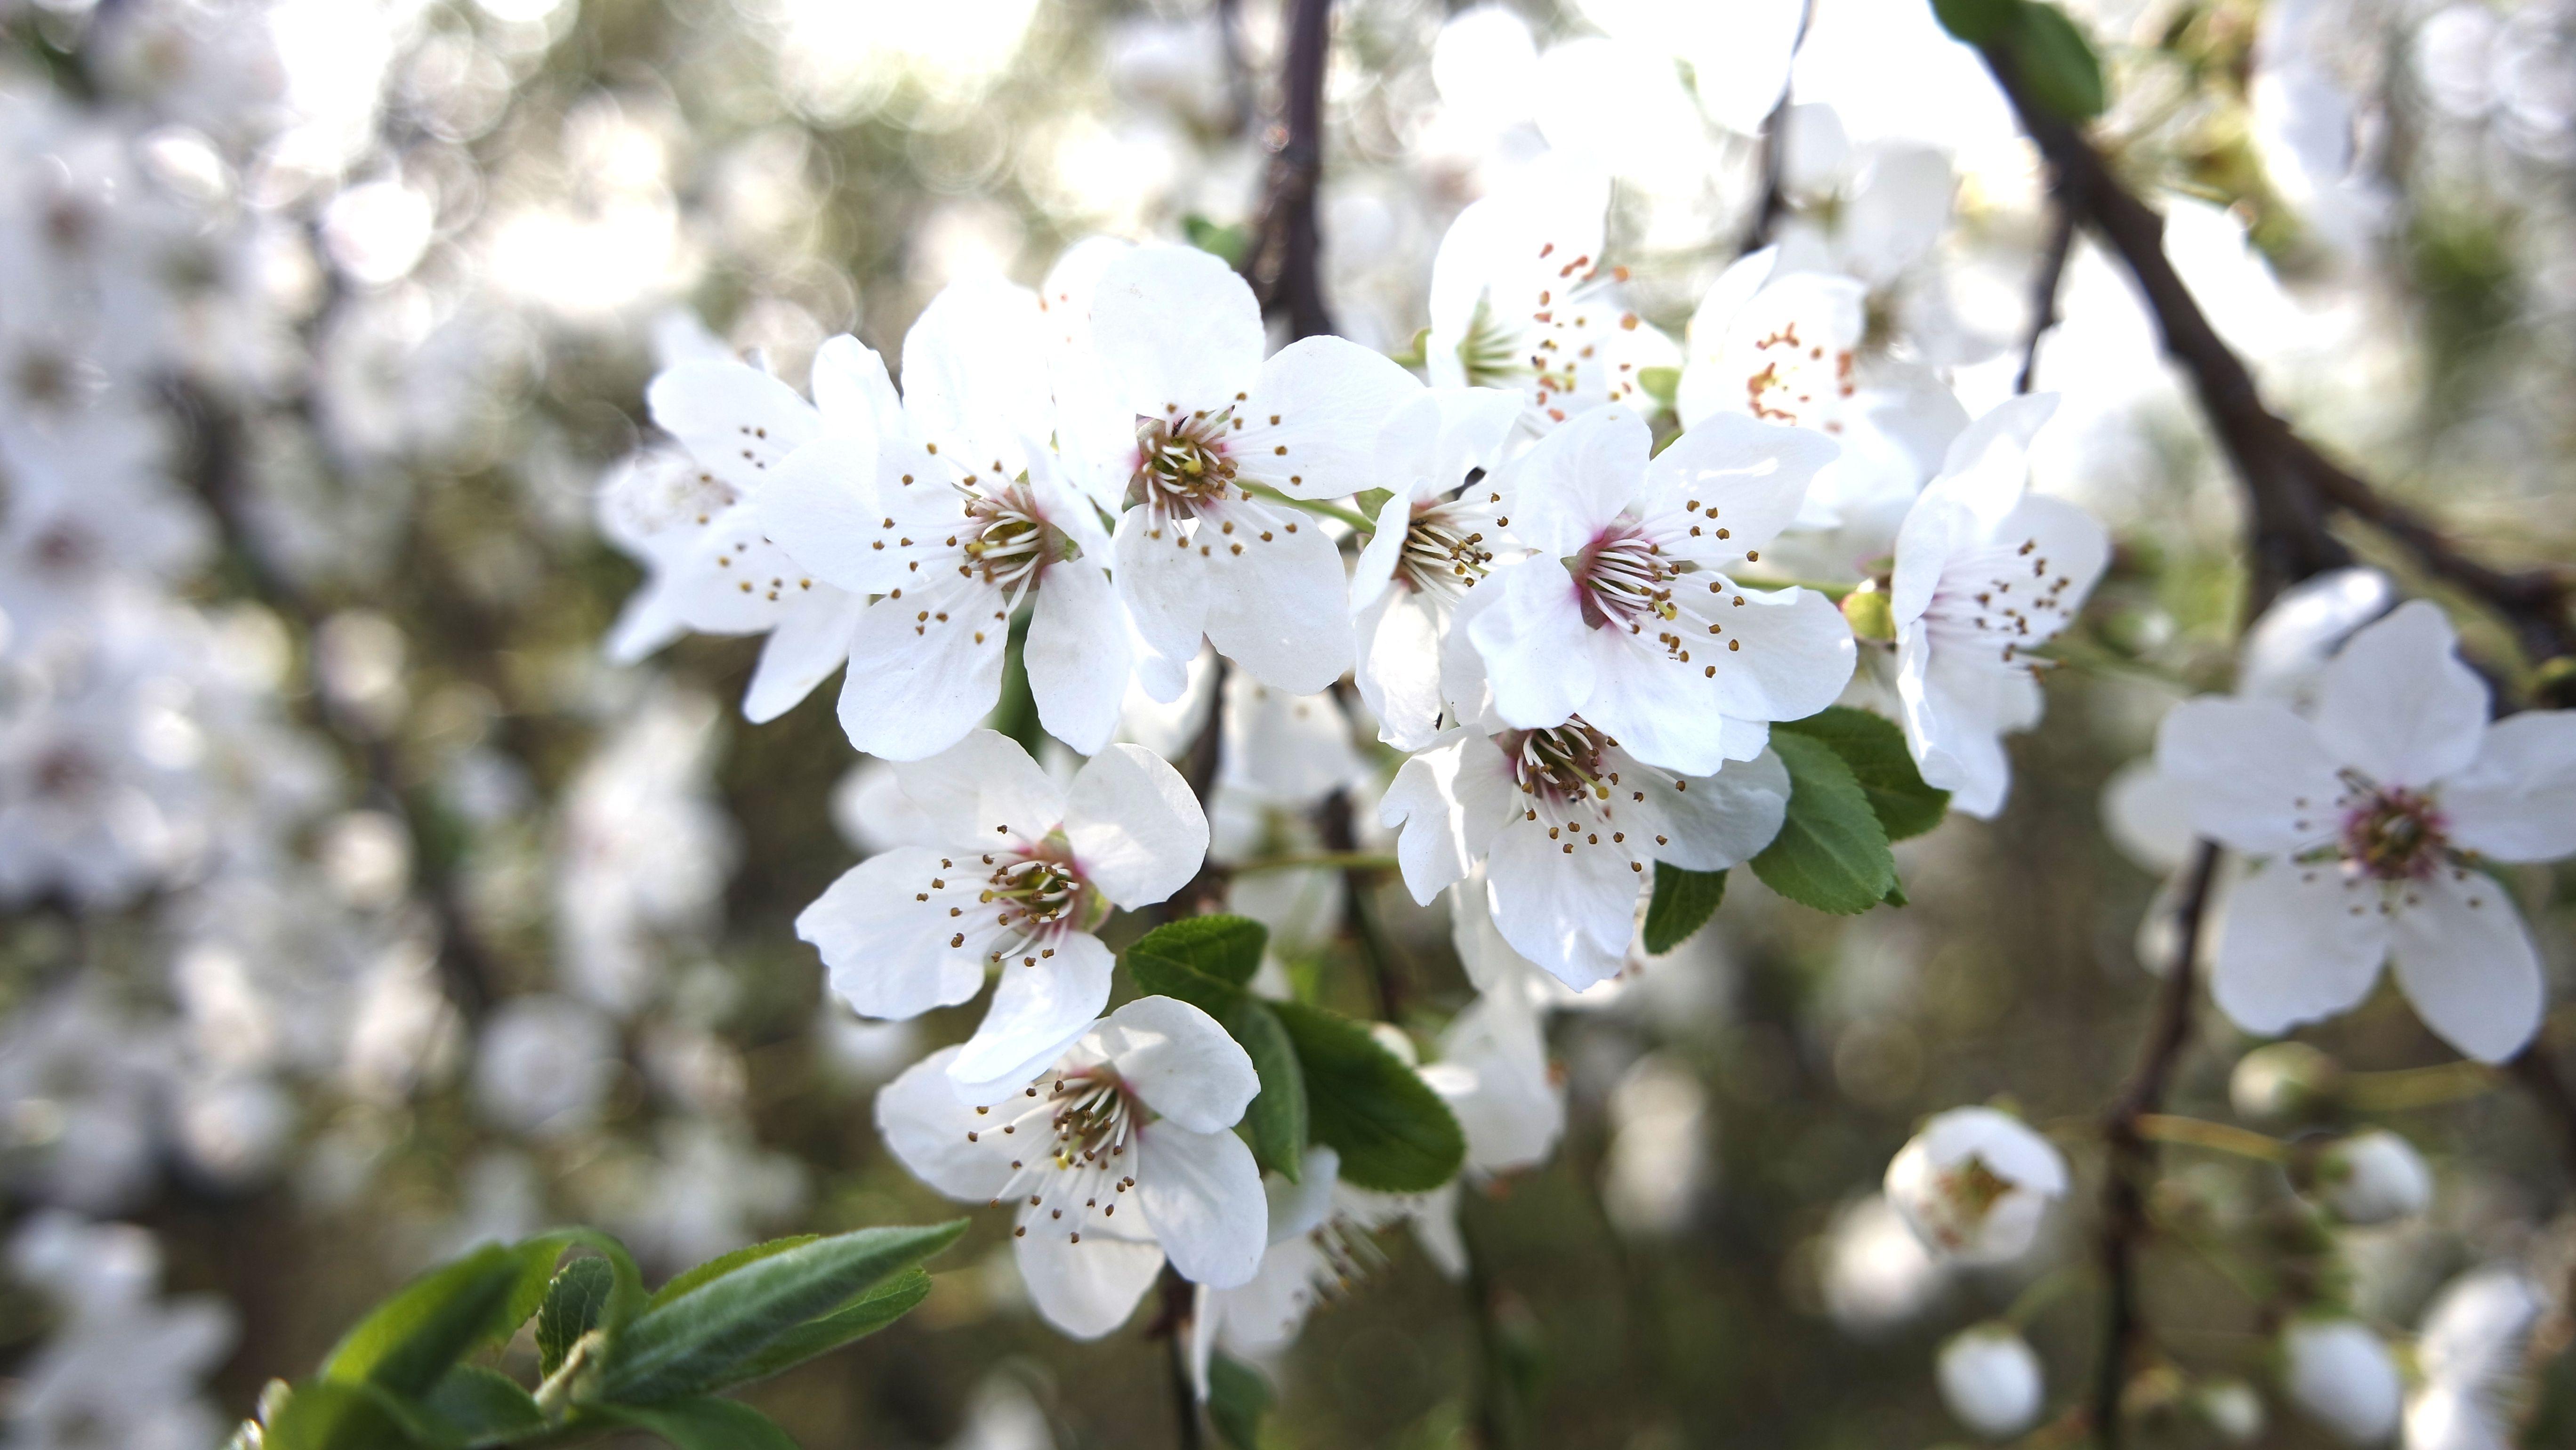 White Tree Flowers Cherry Blossoms Cherry Blossom Images White Cherry Blossom White Tree